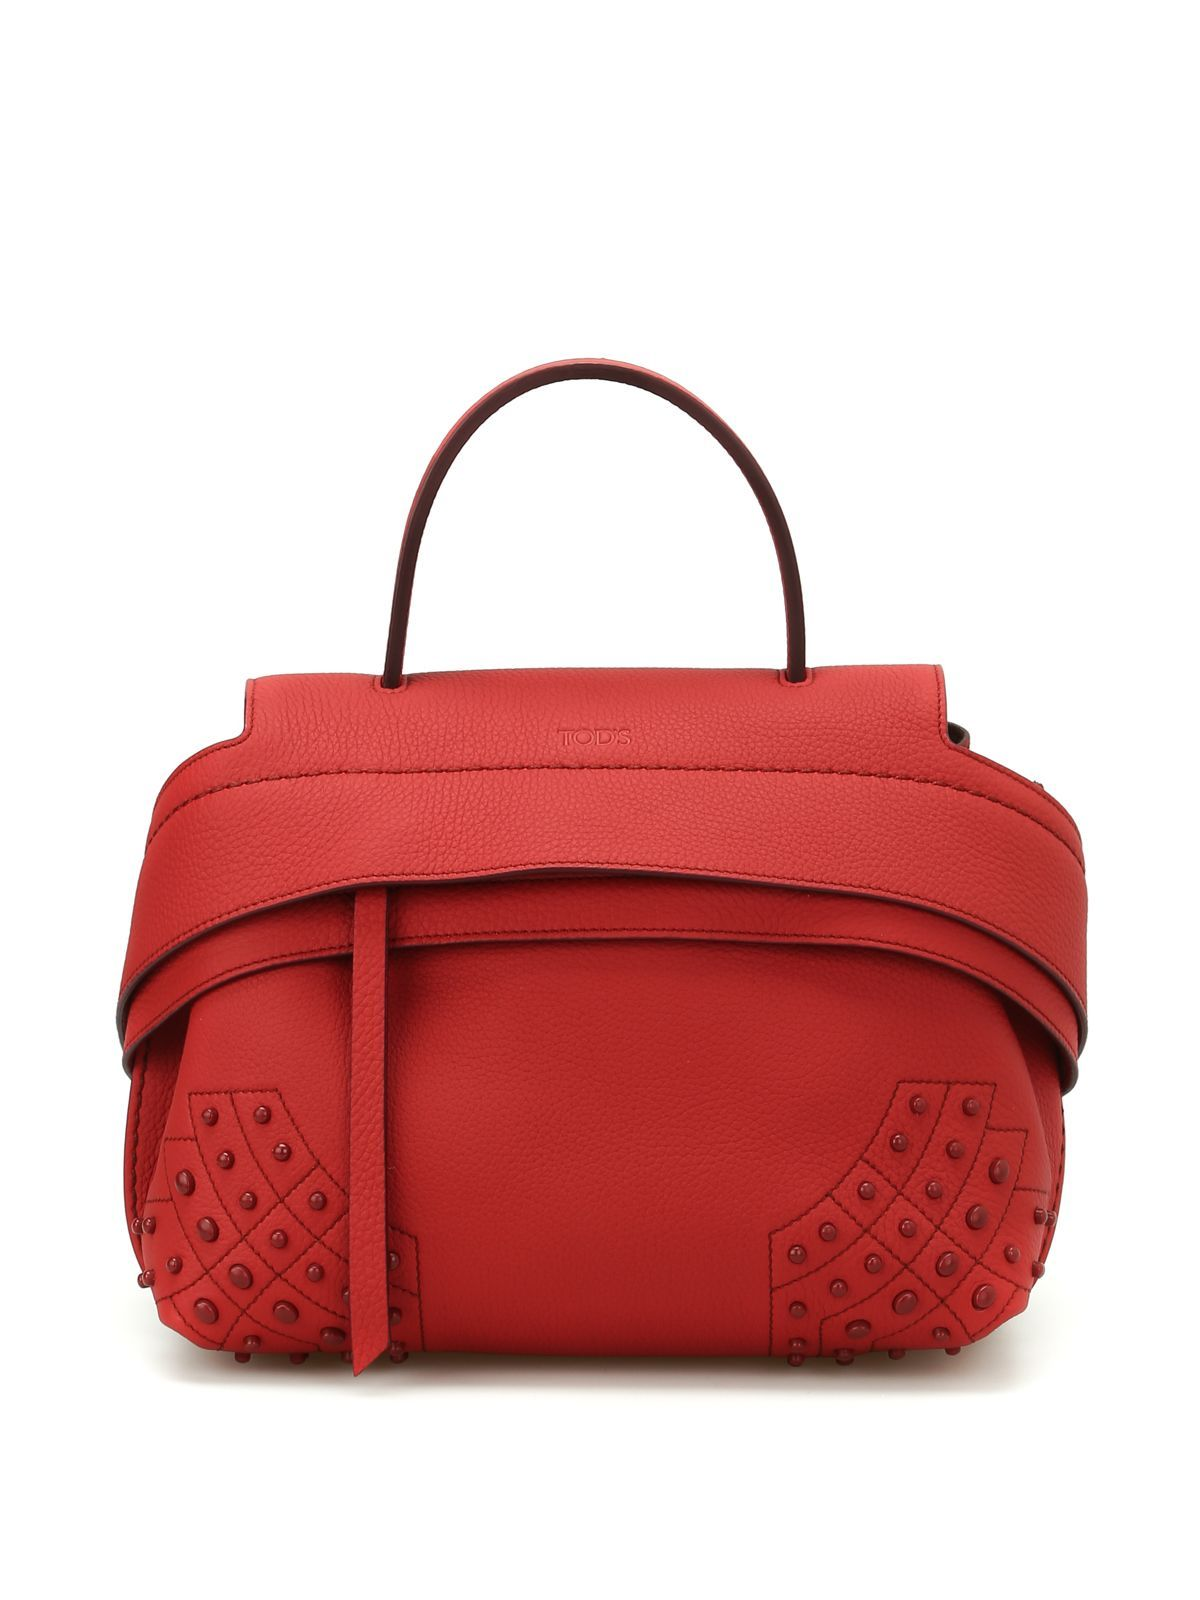 10e80fd1bd07 TOD S WAVE LEATHER MINI SHOULDER BAG.  tods  bags  shoulder bags  hand bags   leather  lining